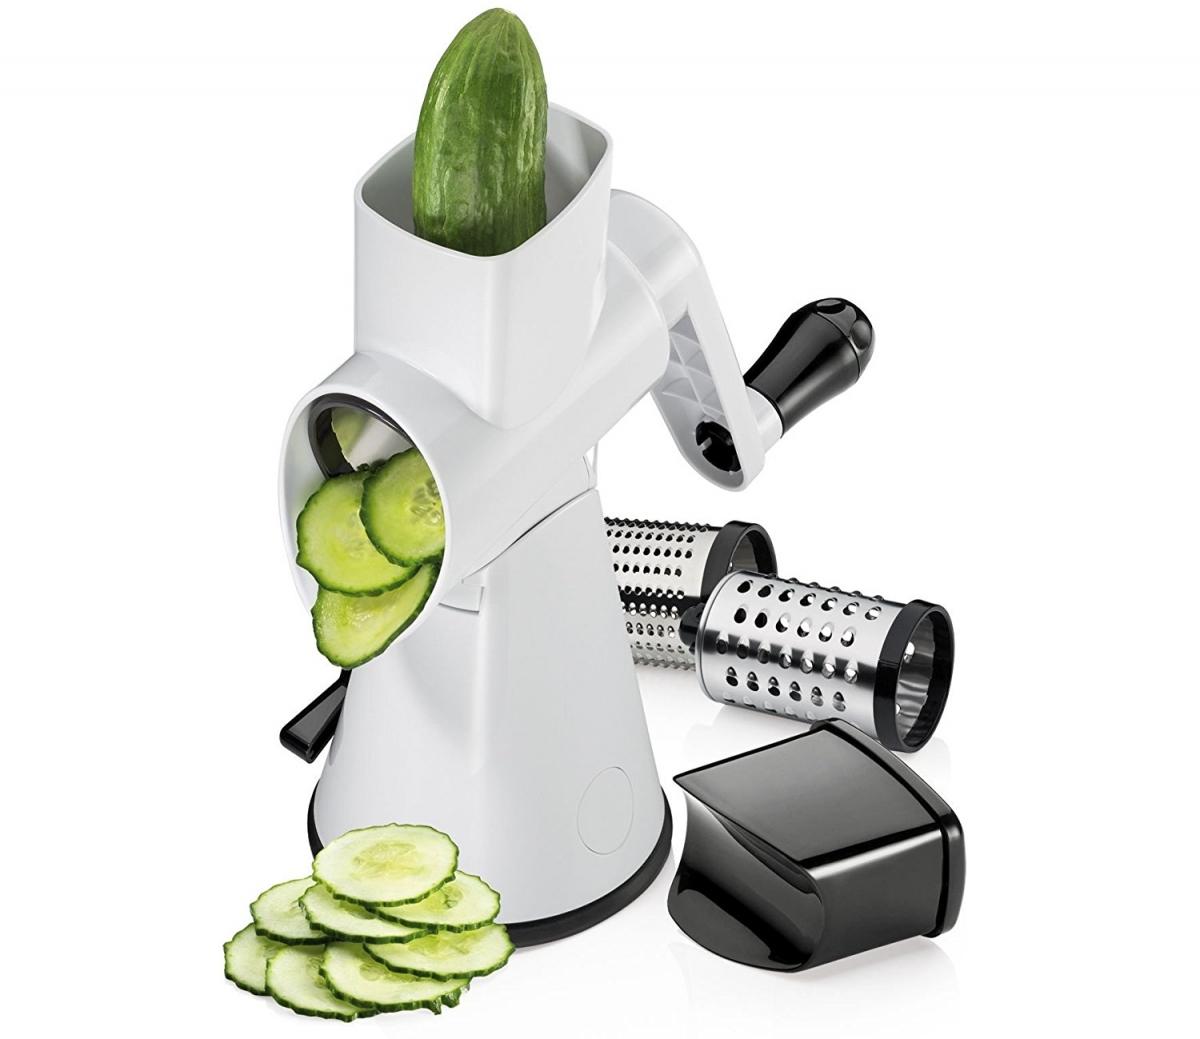 Küchenprofi struhadlo Rapid série Veggie-Fit, 3 struhadla